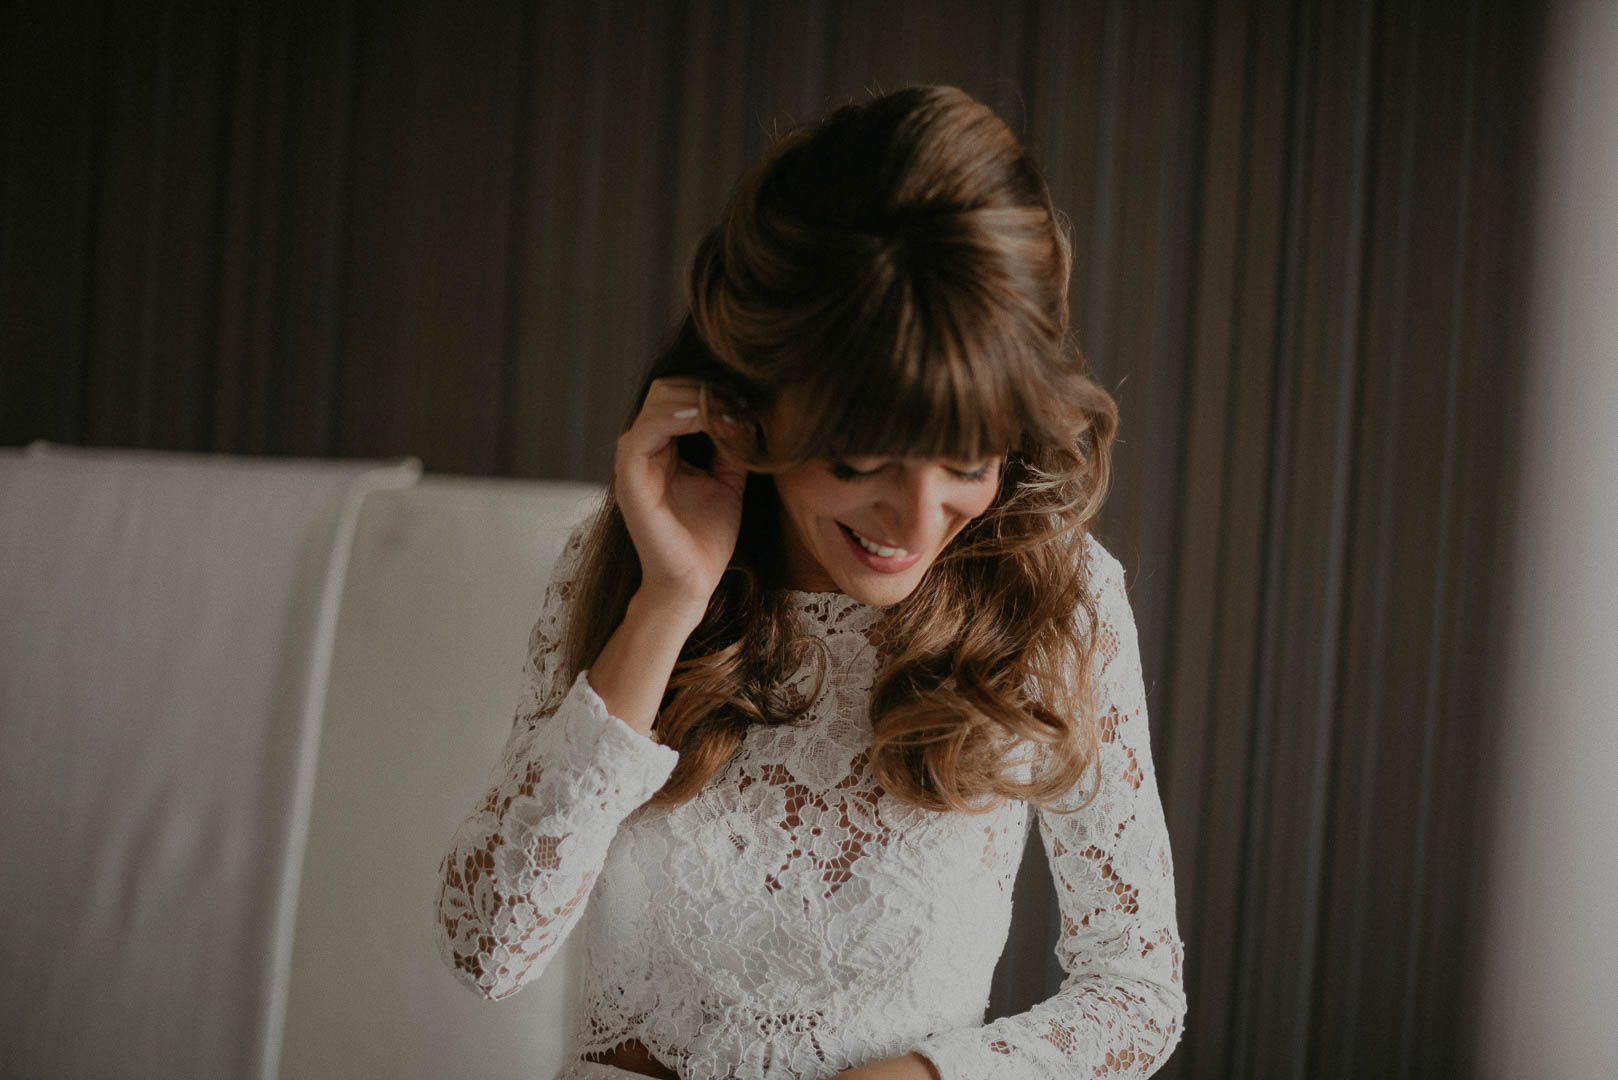 wedding-photographer-destination-fineart-bespoke-reportage-napoli-nabilah-vivianeizzo-spazio46-47